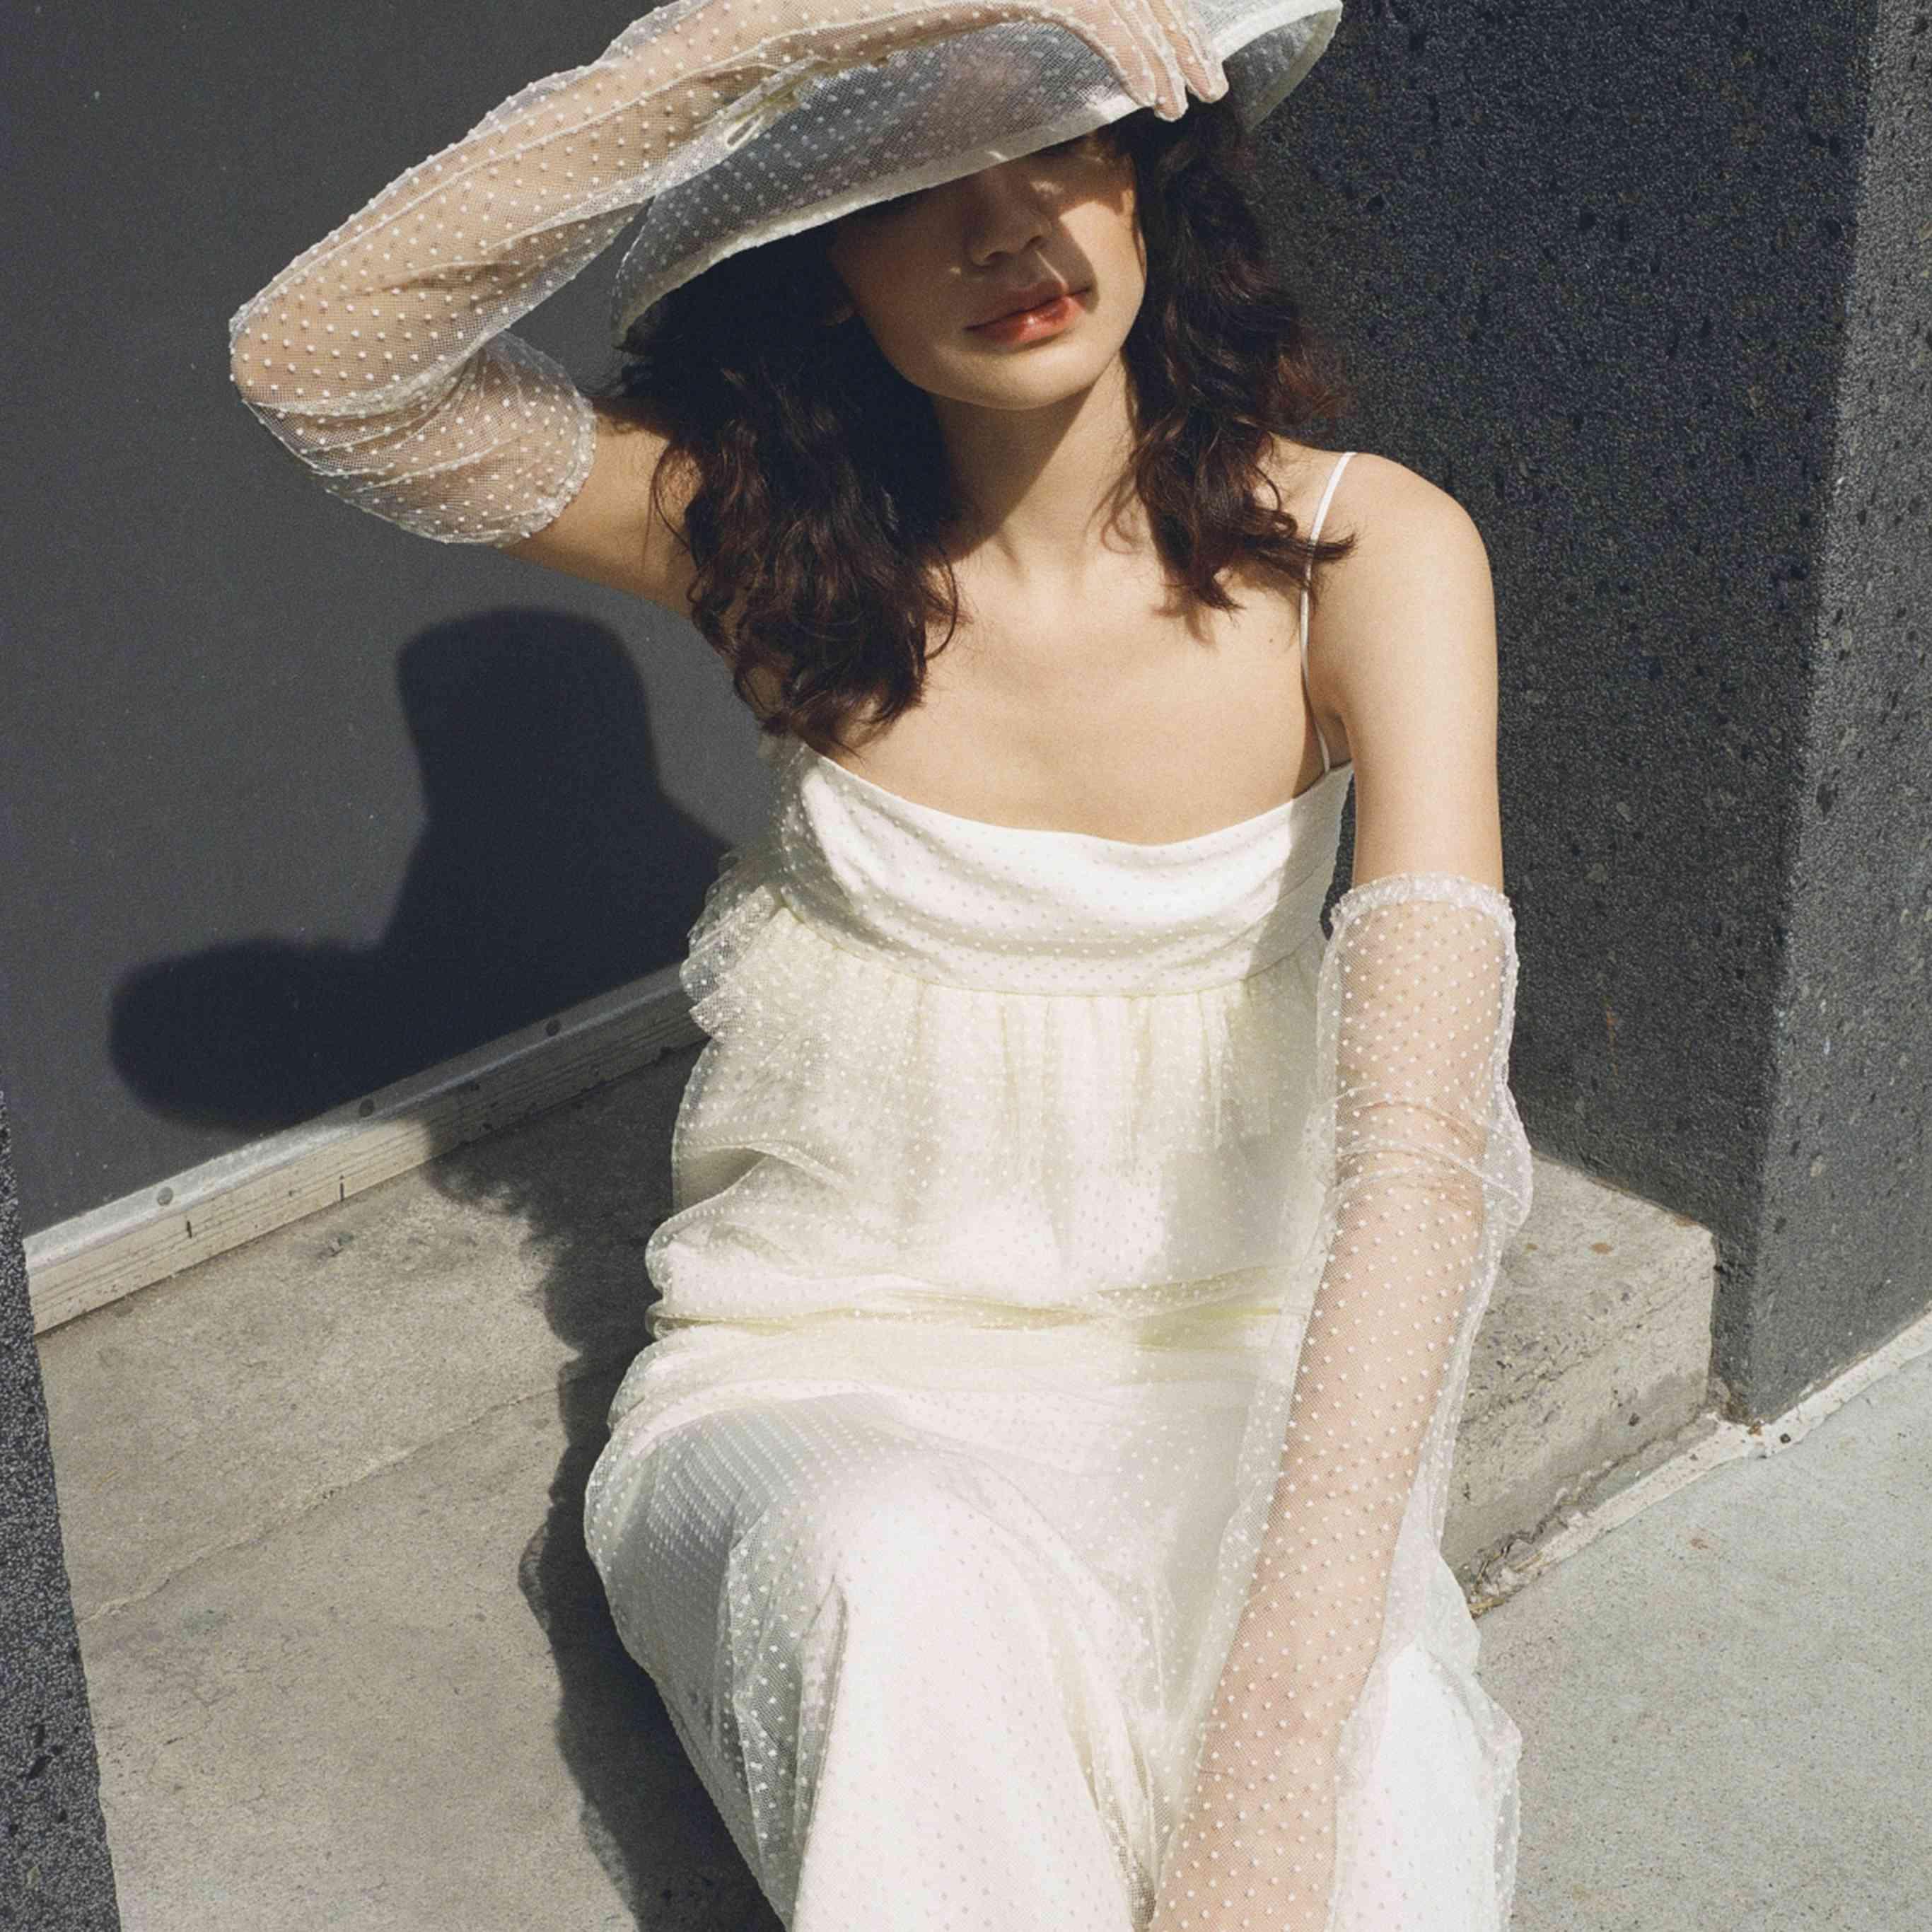 Model in ruffled slip wedding dress